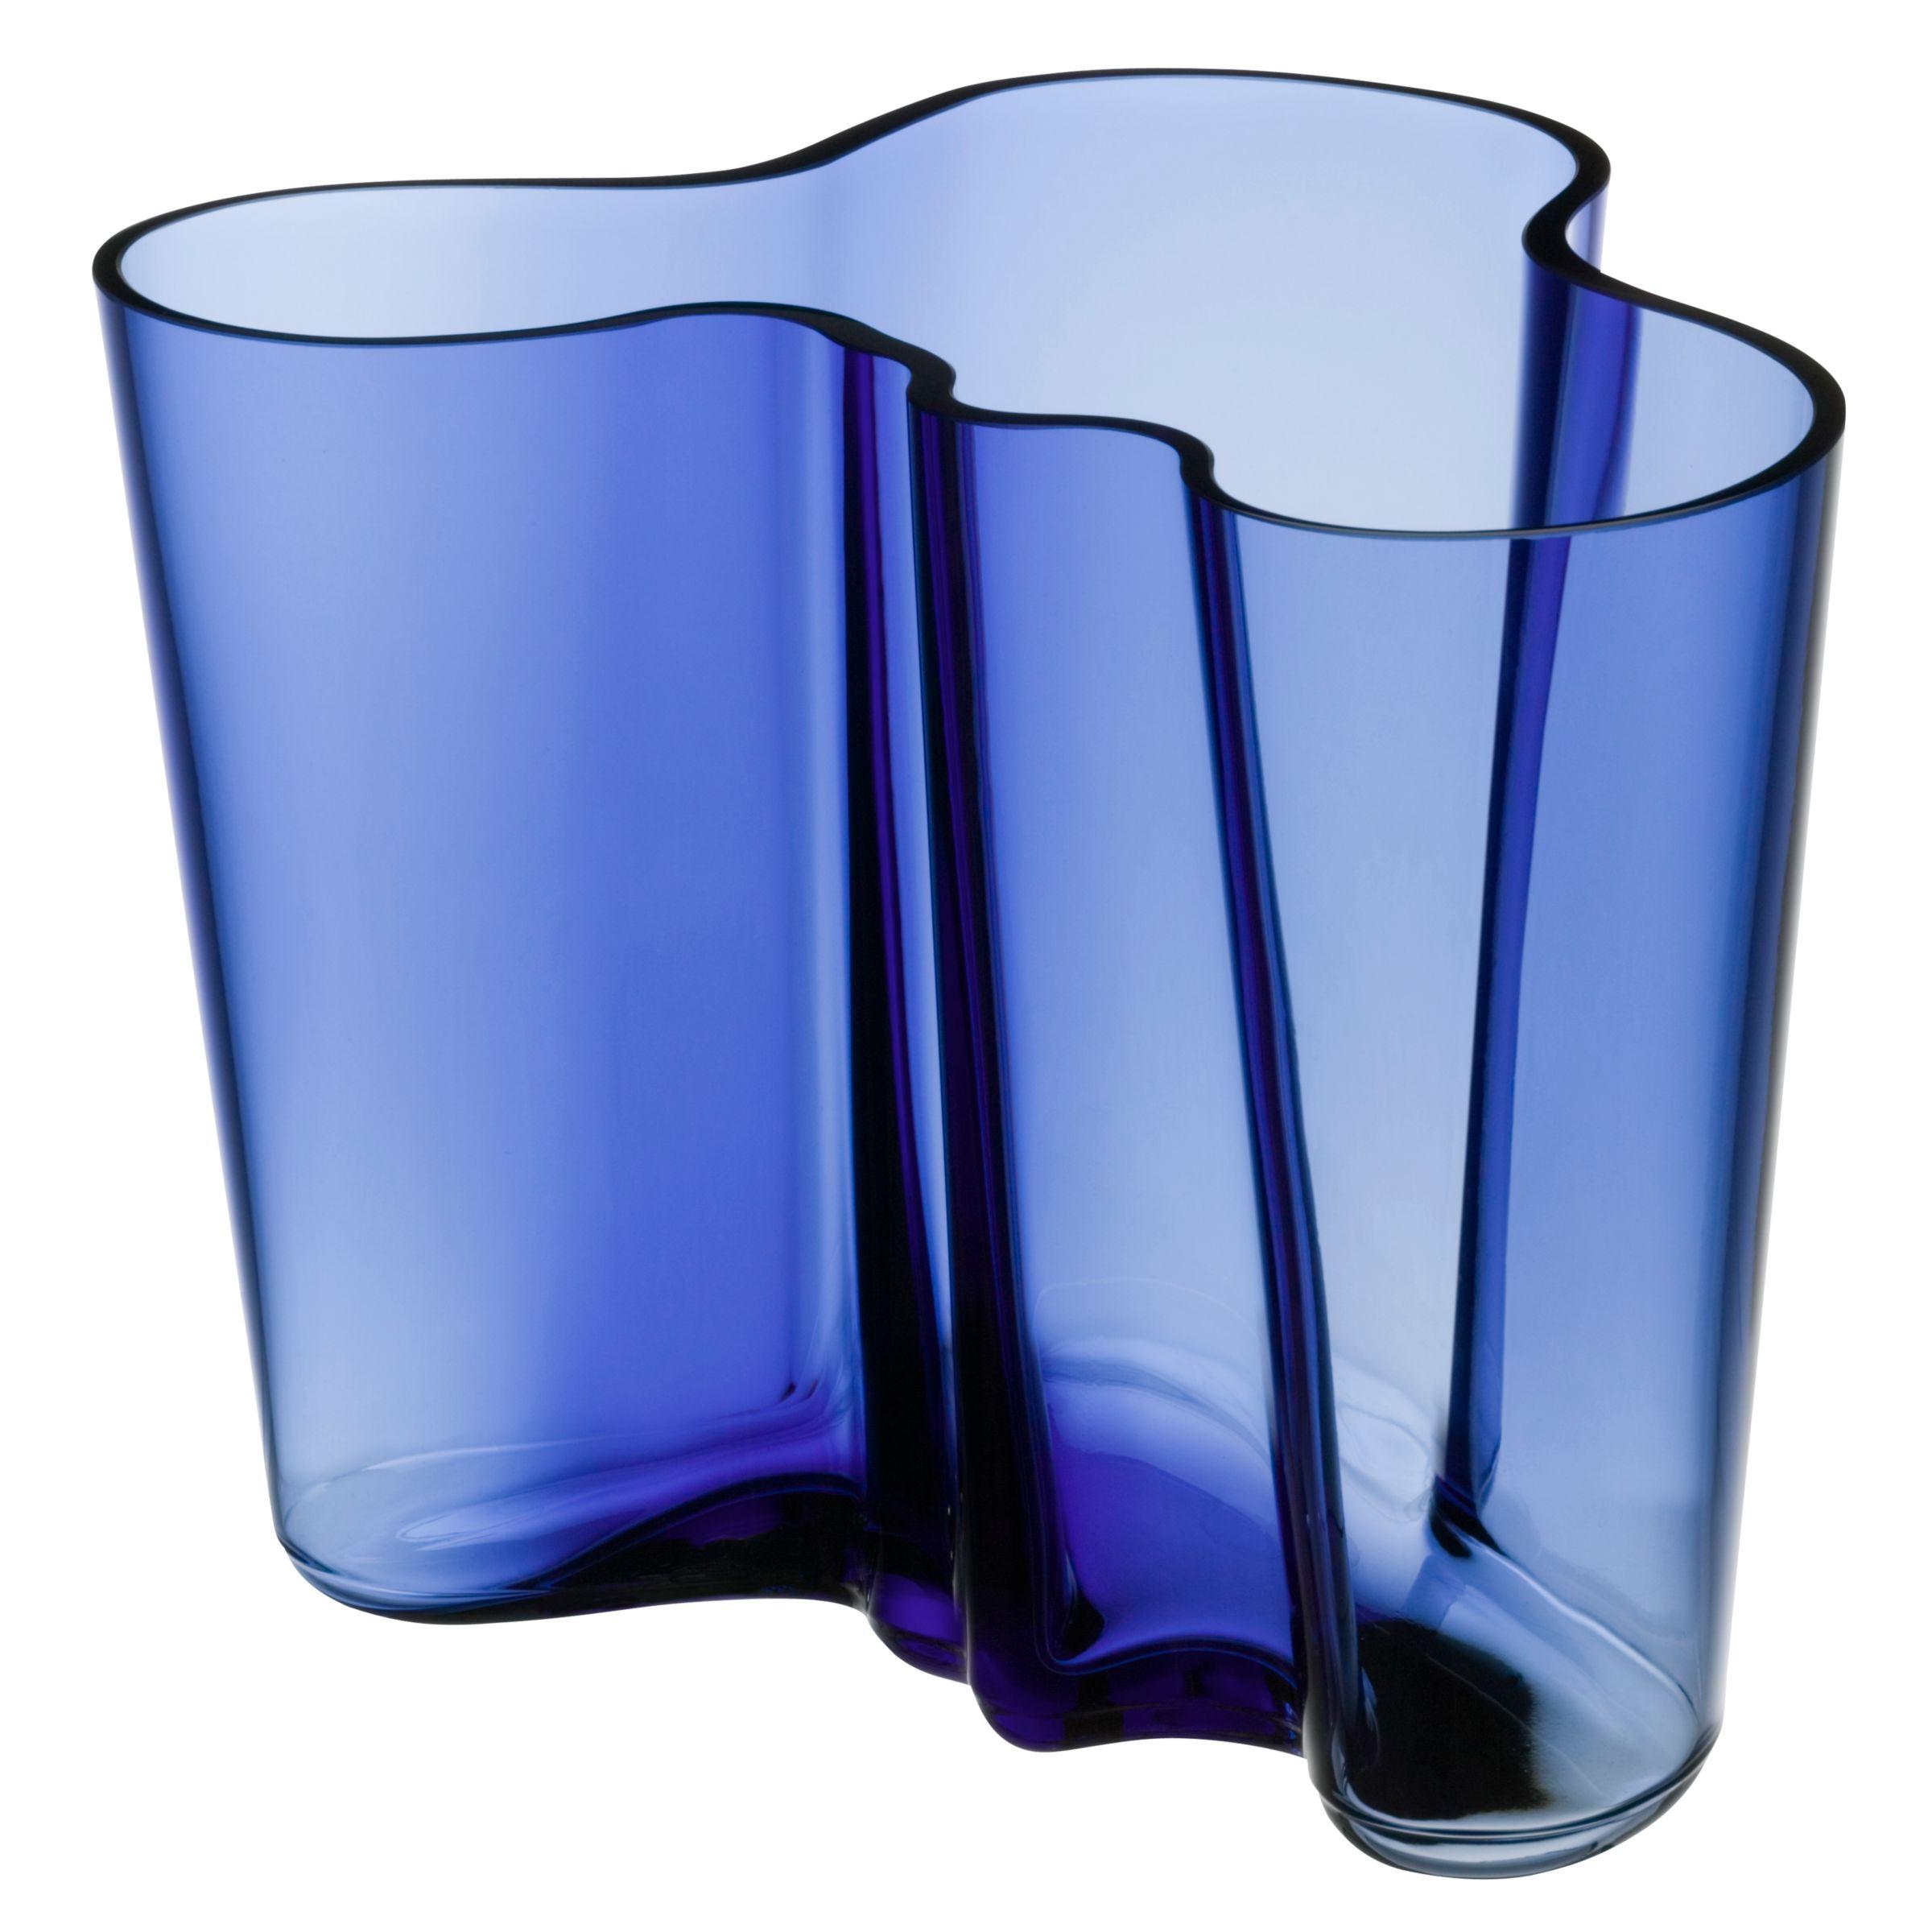 Iittala Iittala Aalto Vase, H16cm, Blue